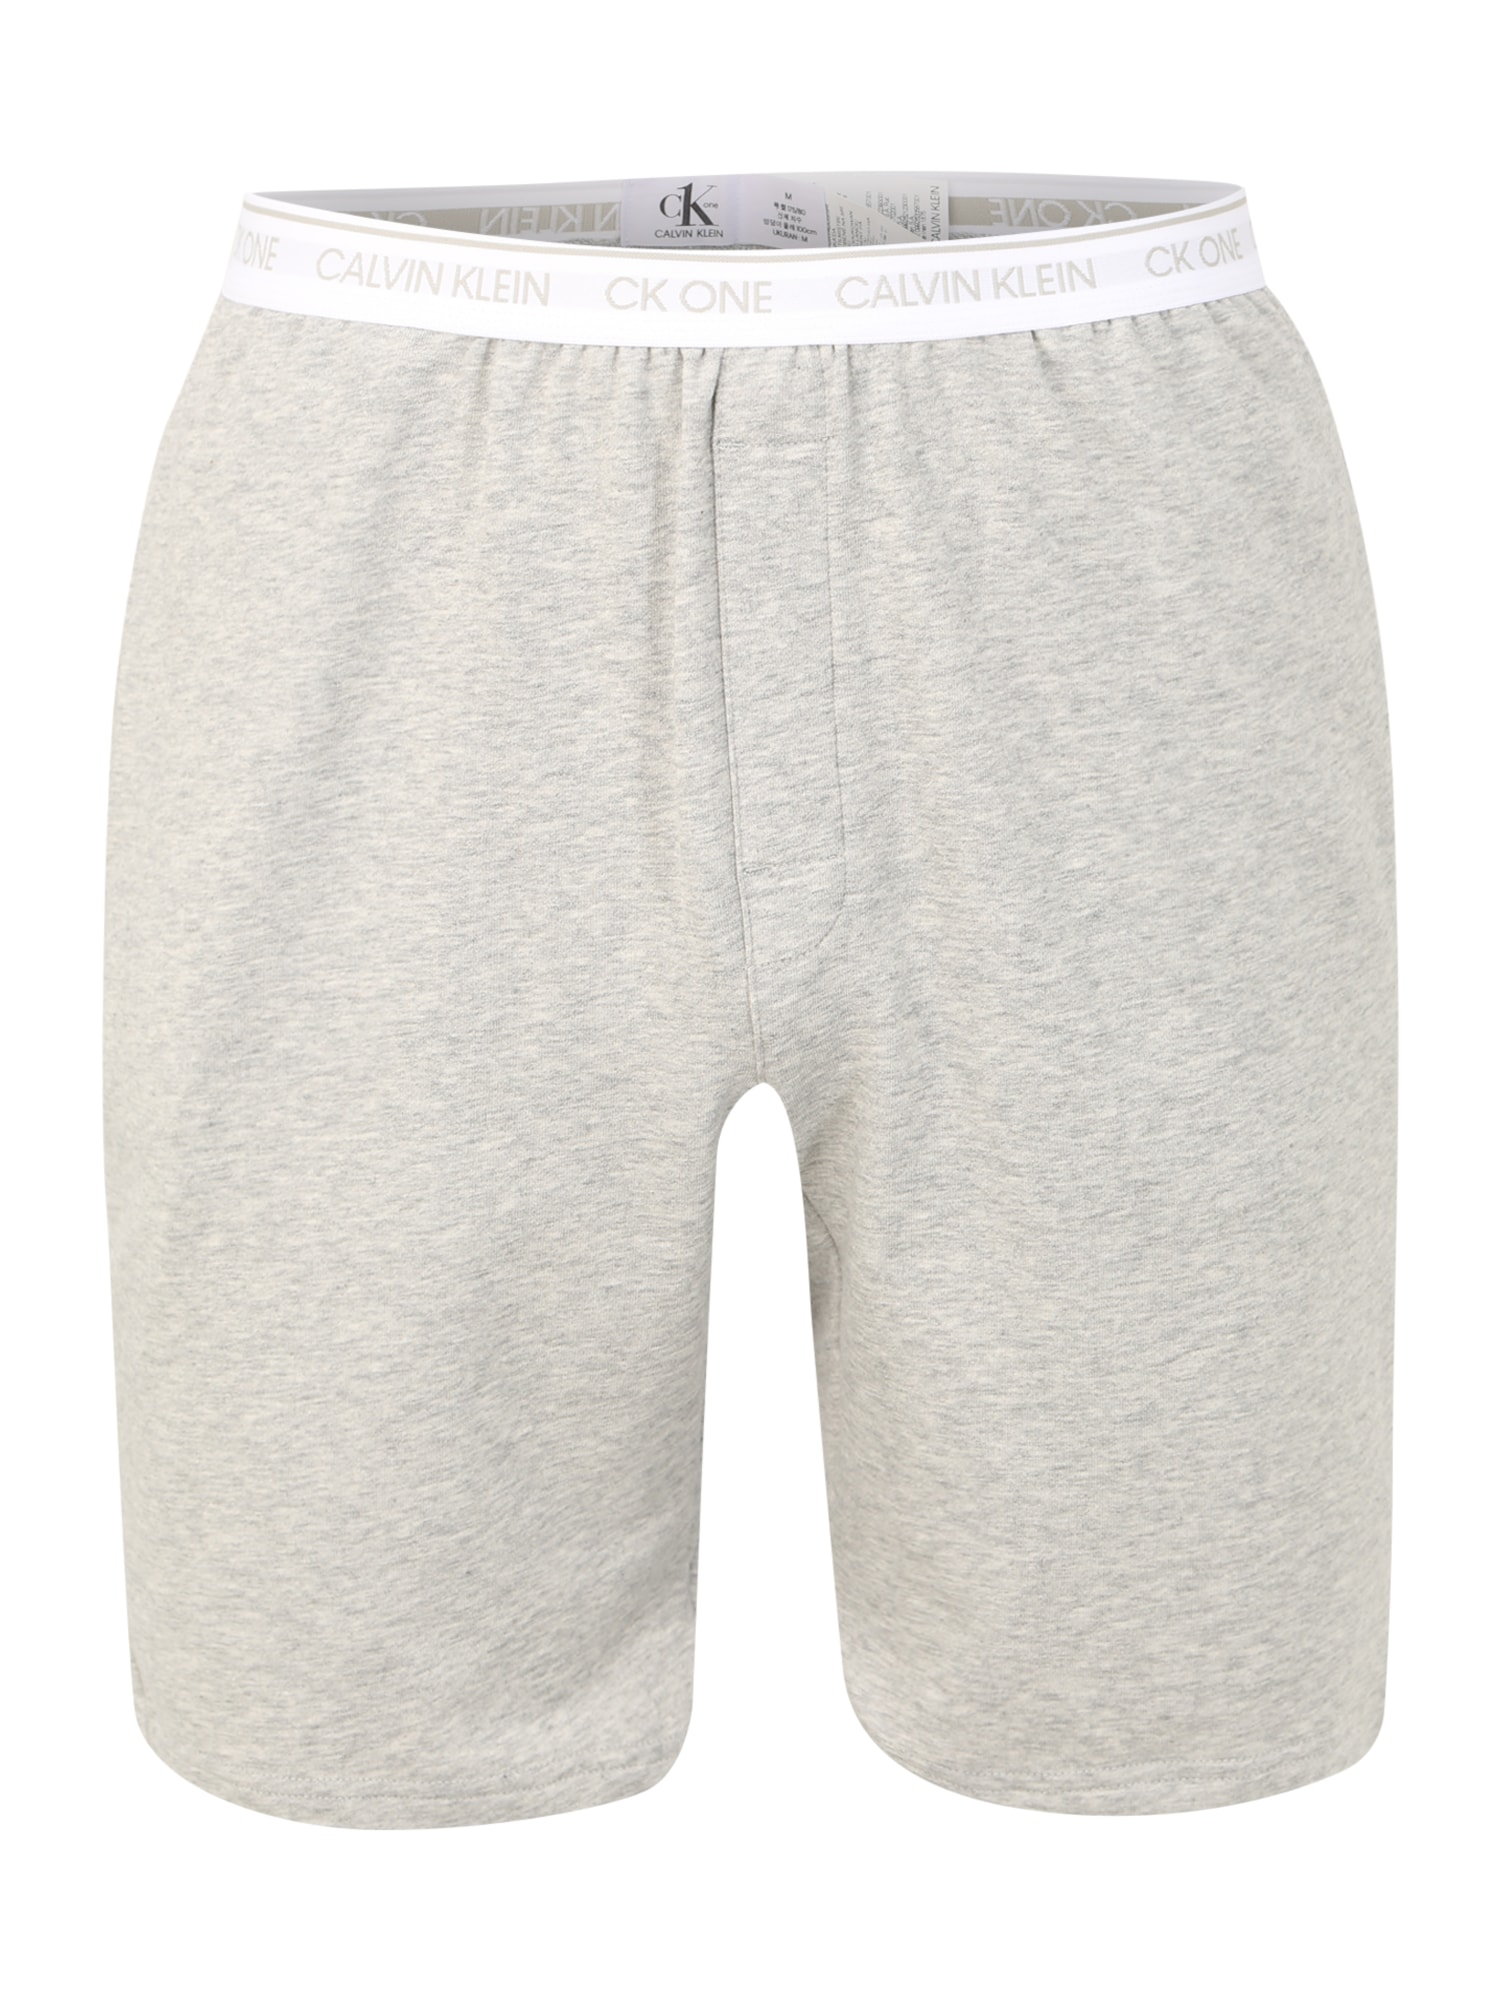 Calvin Klein Underwear Ilgos apatinės kelnaitės pilka